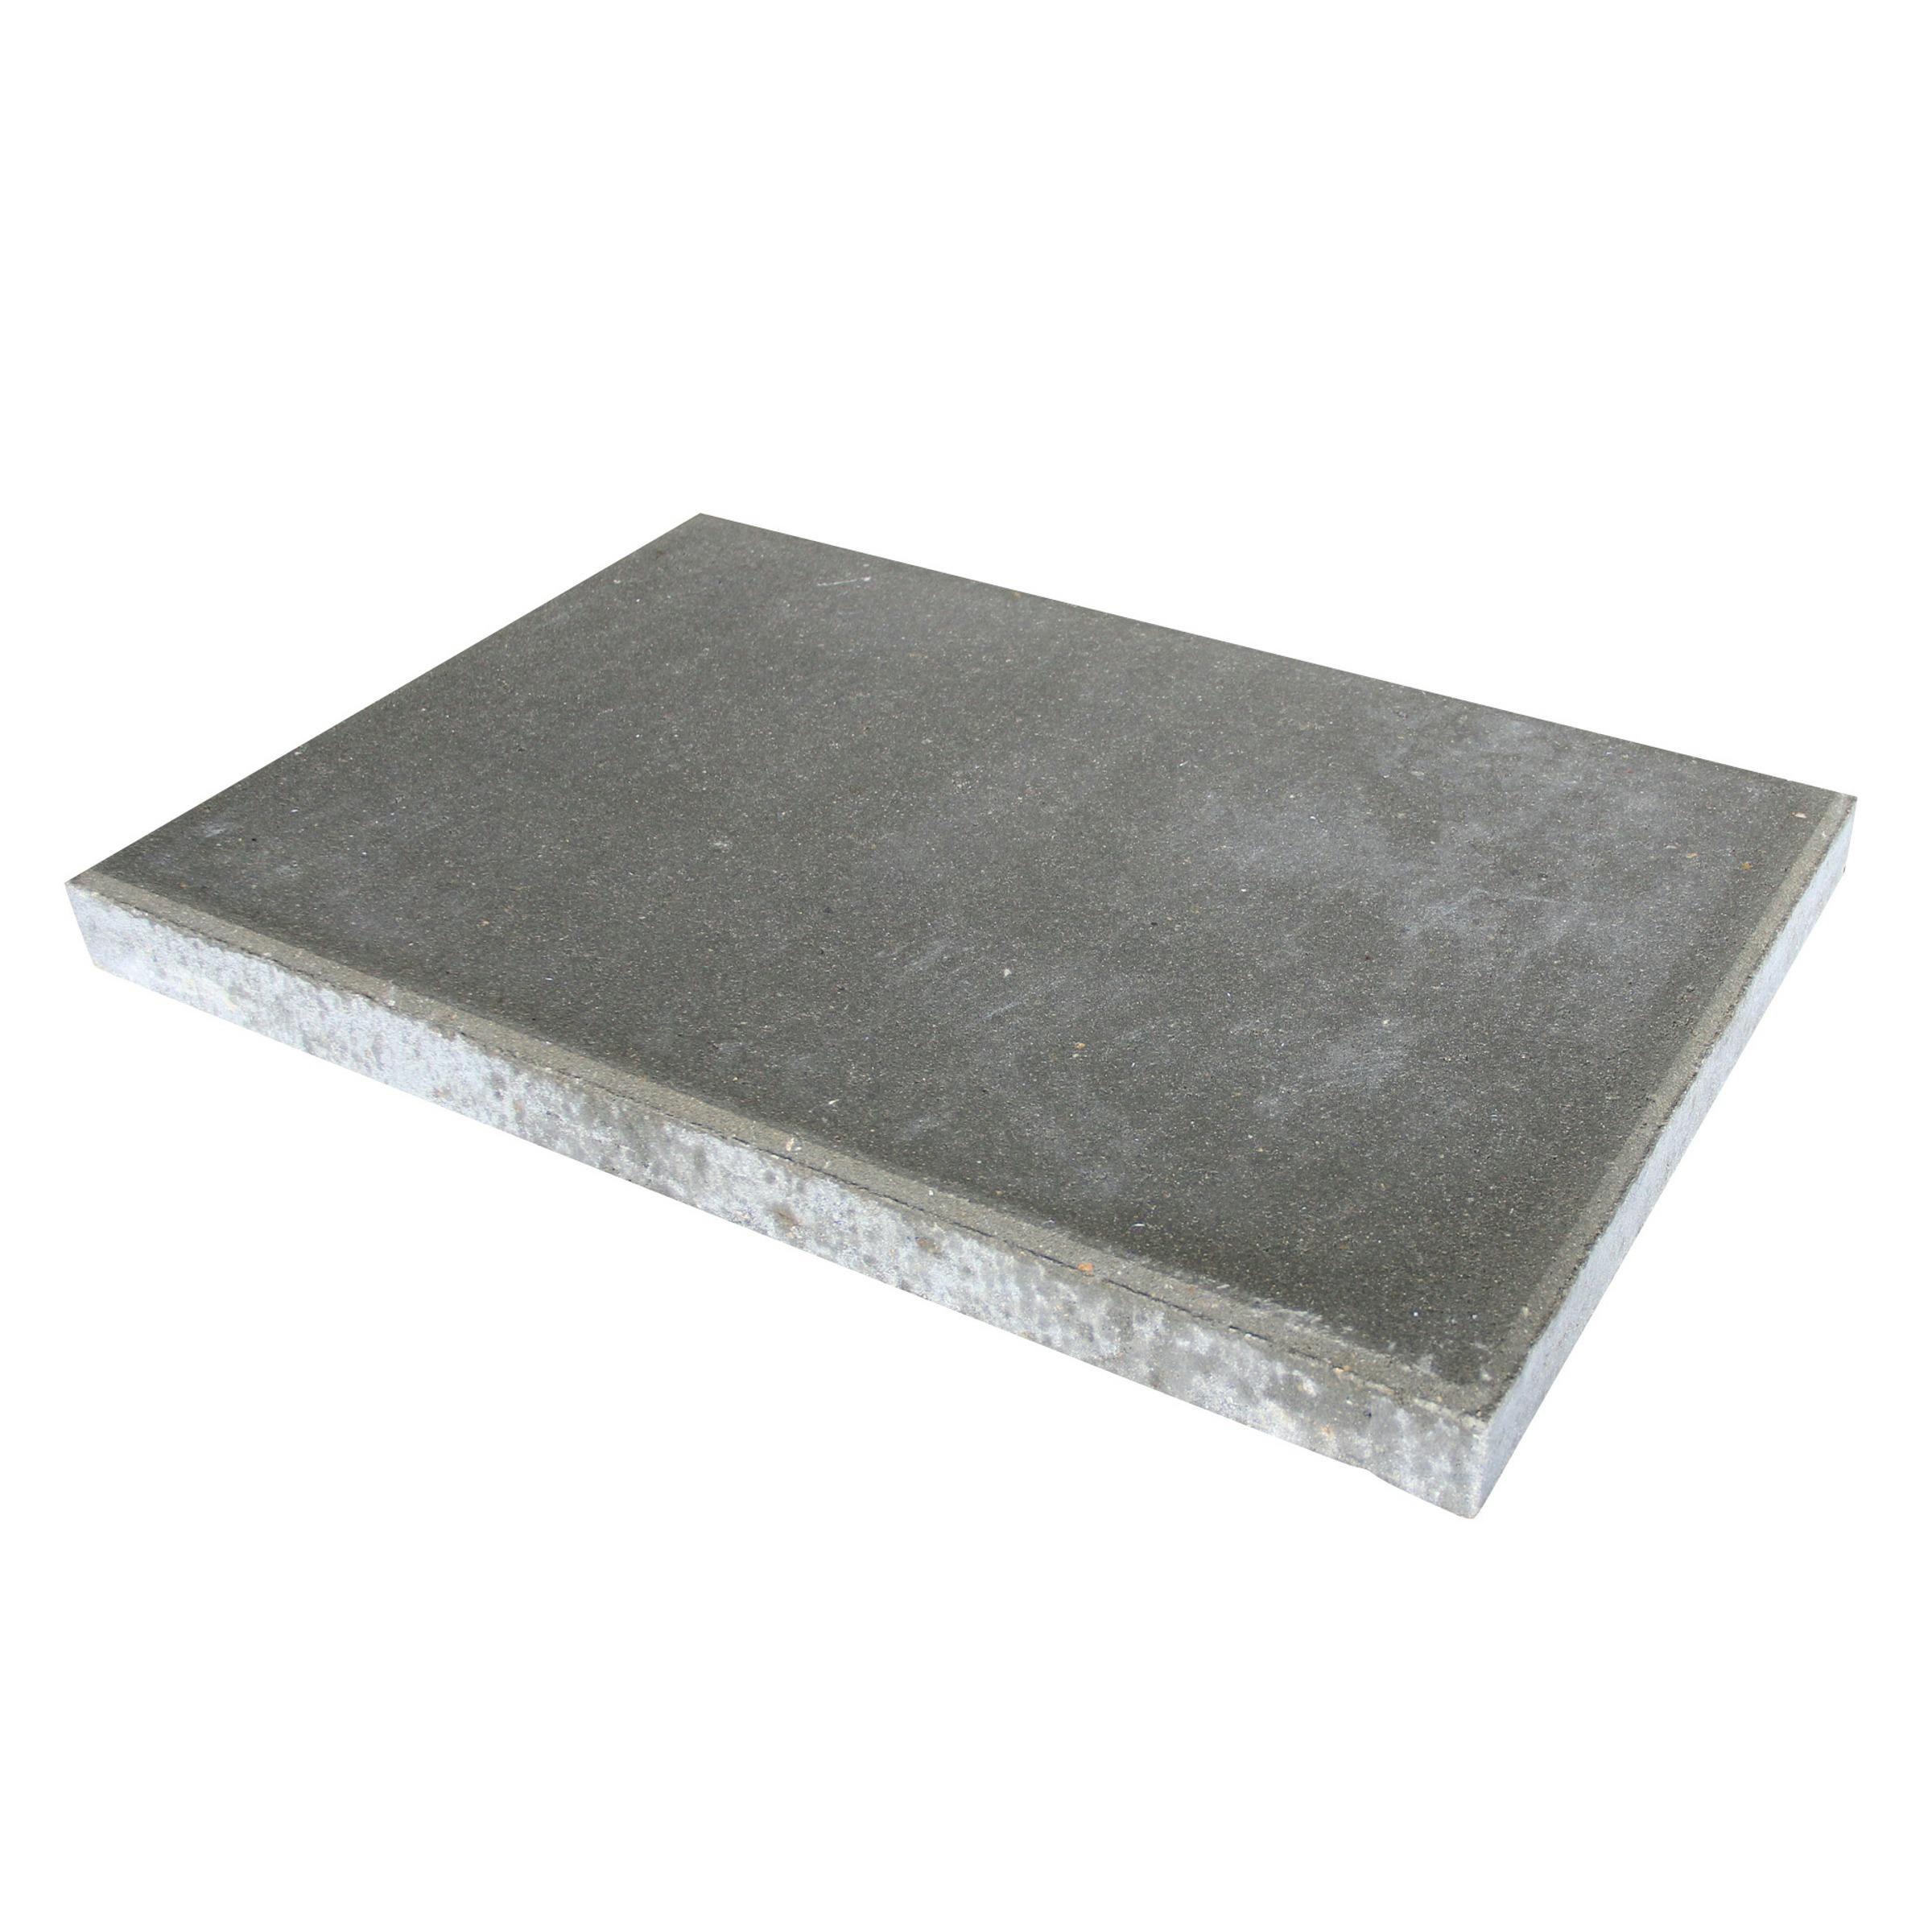 Betontegel Grijs 60x40 cm 50 Tegels-12,0 m2